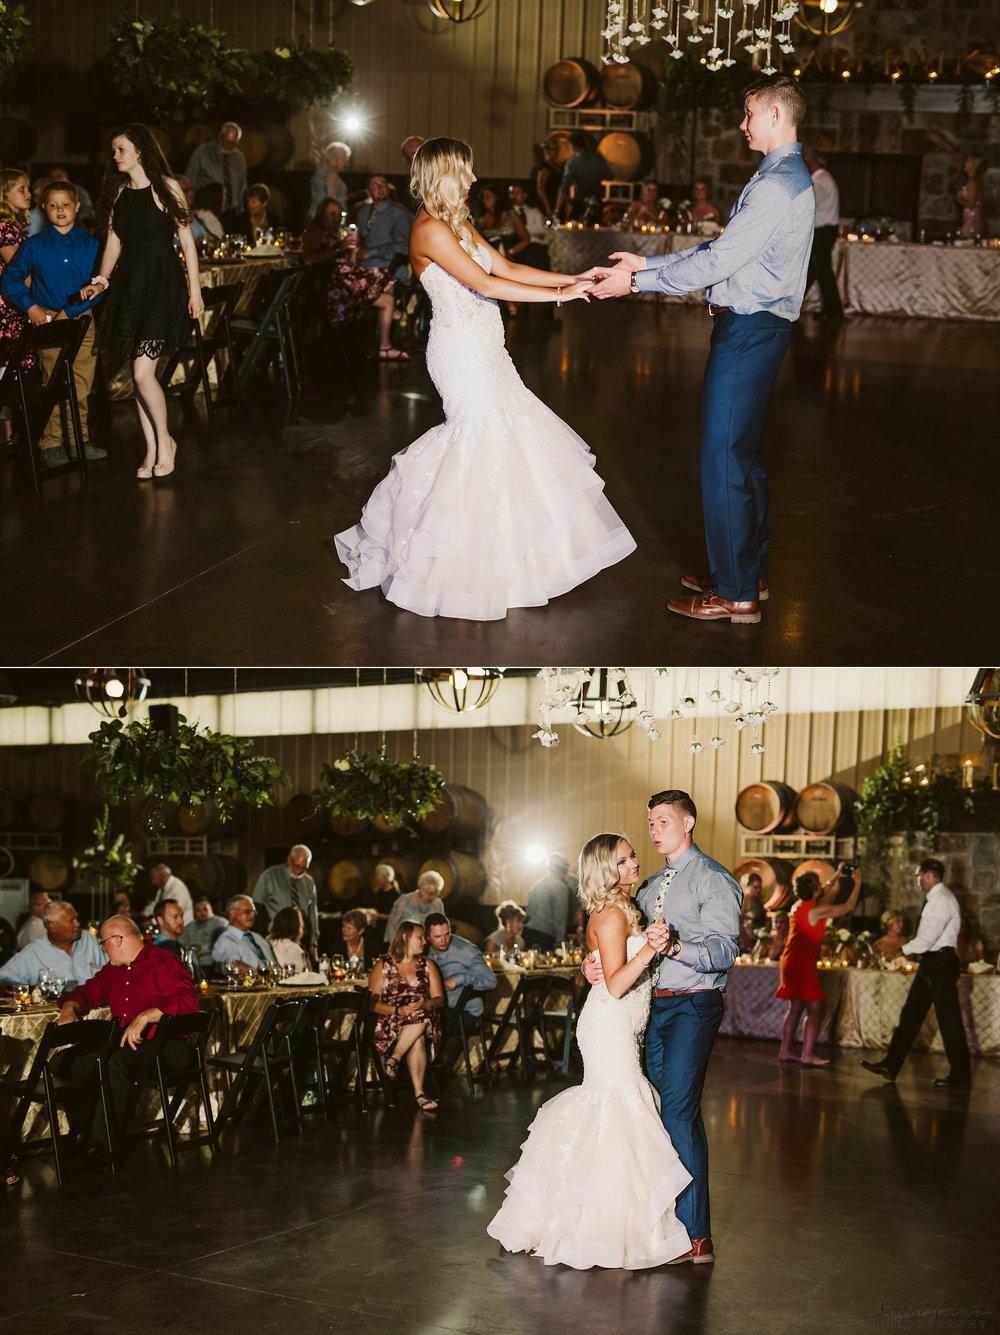 carlos-creek-winery-wedding-alexandria-minnesota-glam-elegant-floral-134.jpg